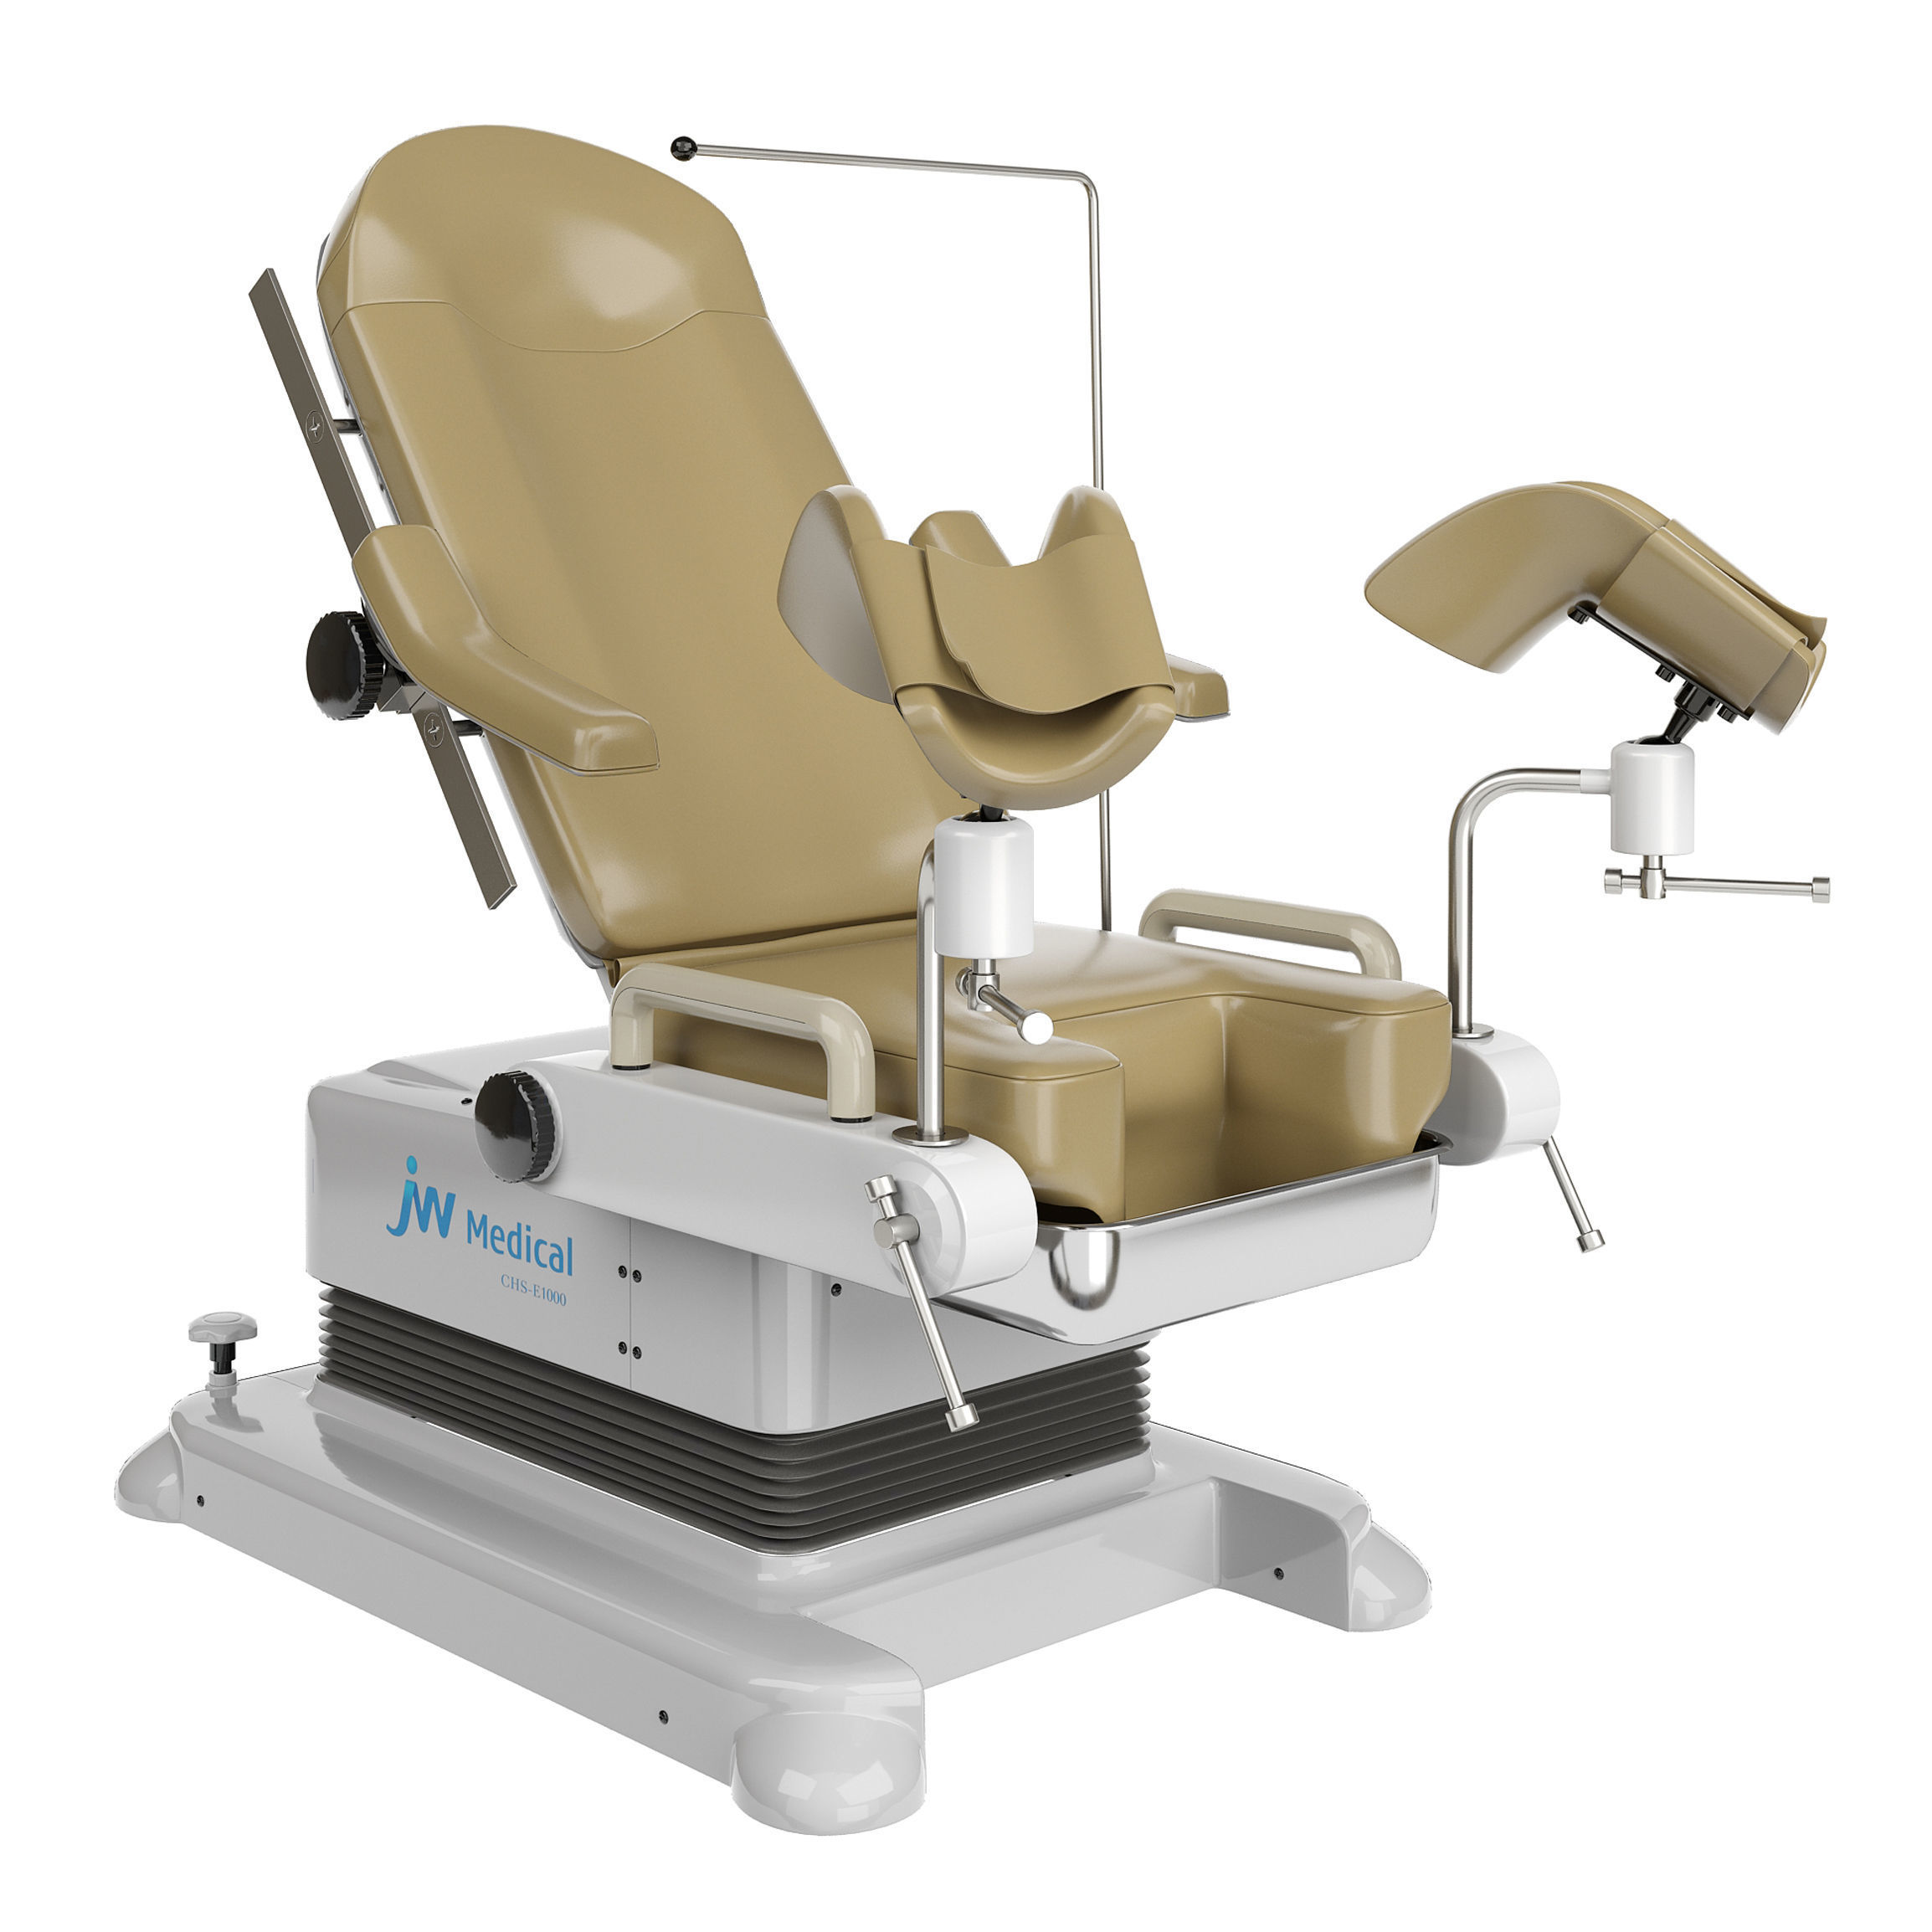 Gynecological examination chair JW MEDICAL CHAIR-2